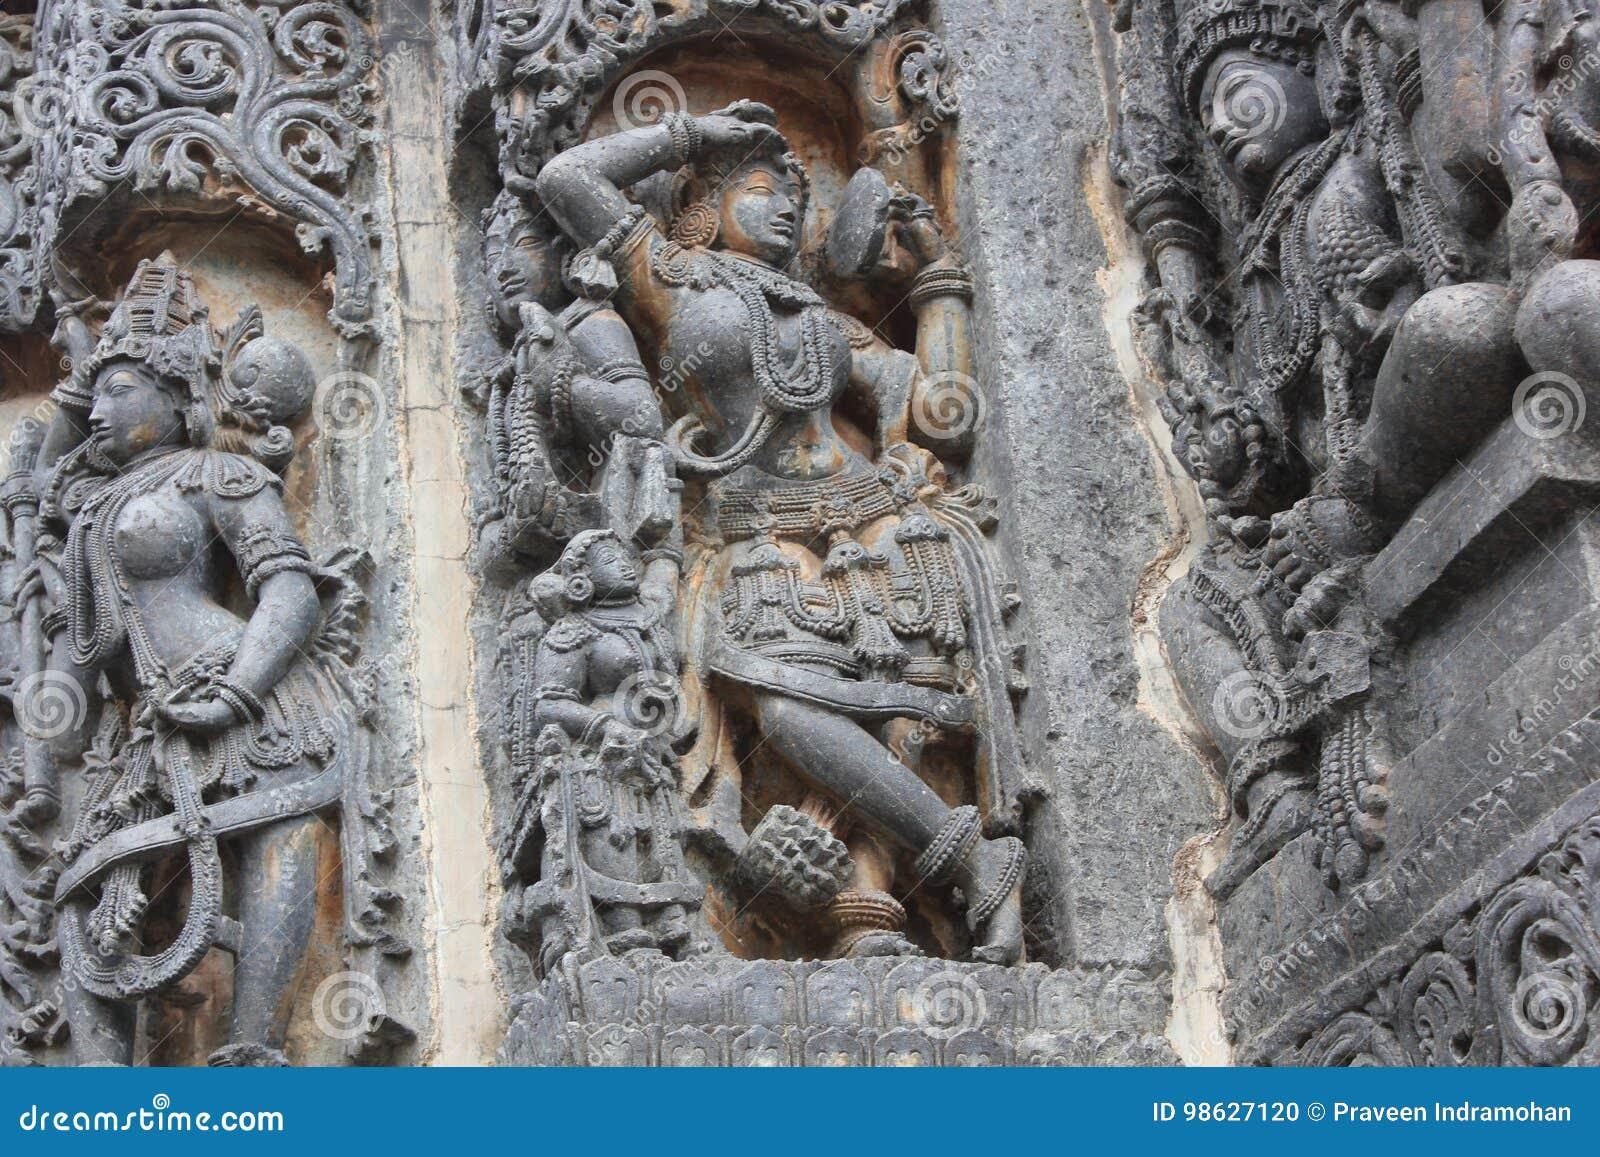 Hoysaleswara Temple wall carved with sculpture of Darpana Sundari beautiful lady with mirror